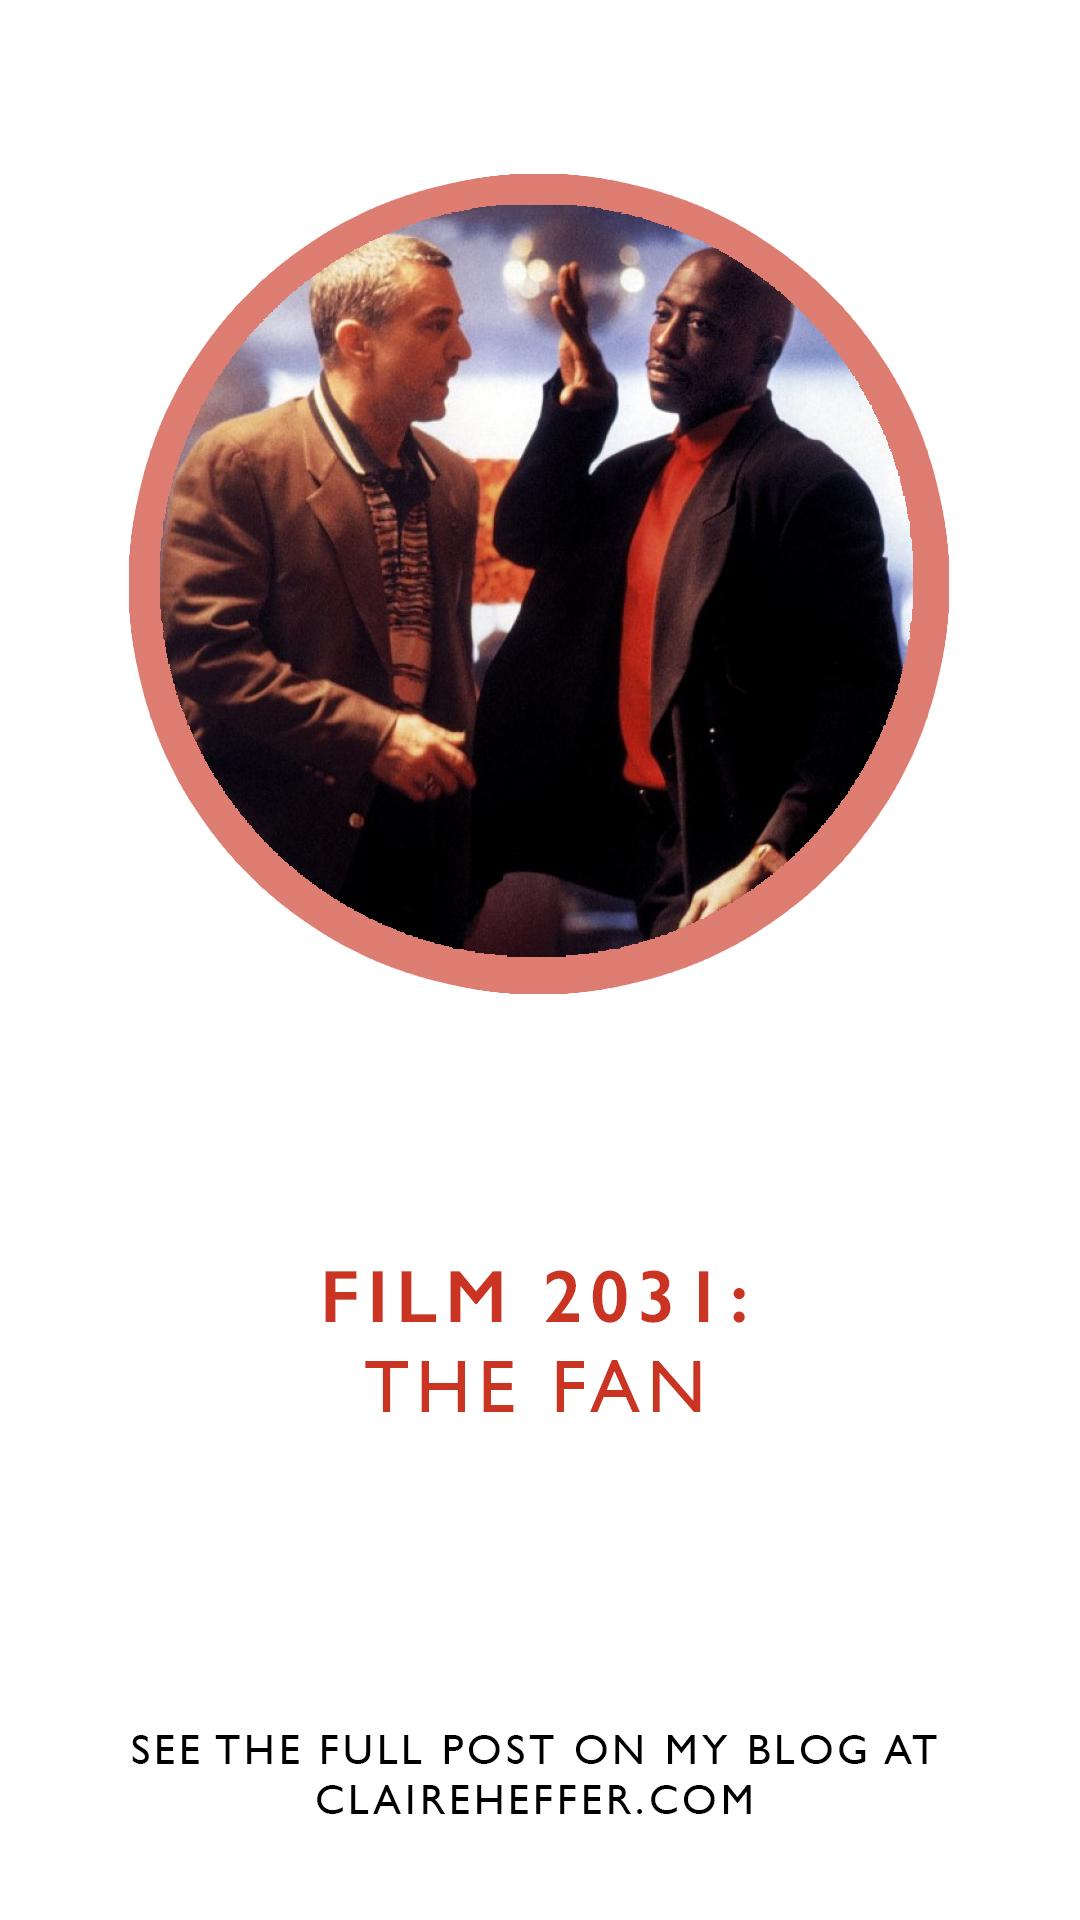 FILM 2031_THE FAN_deniro_snipes